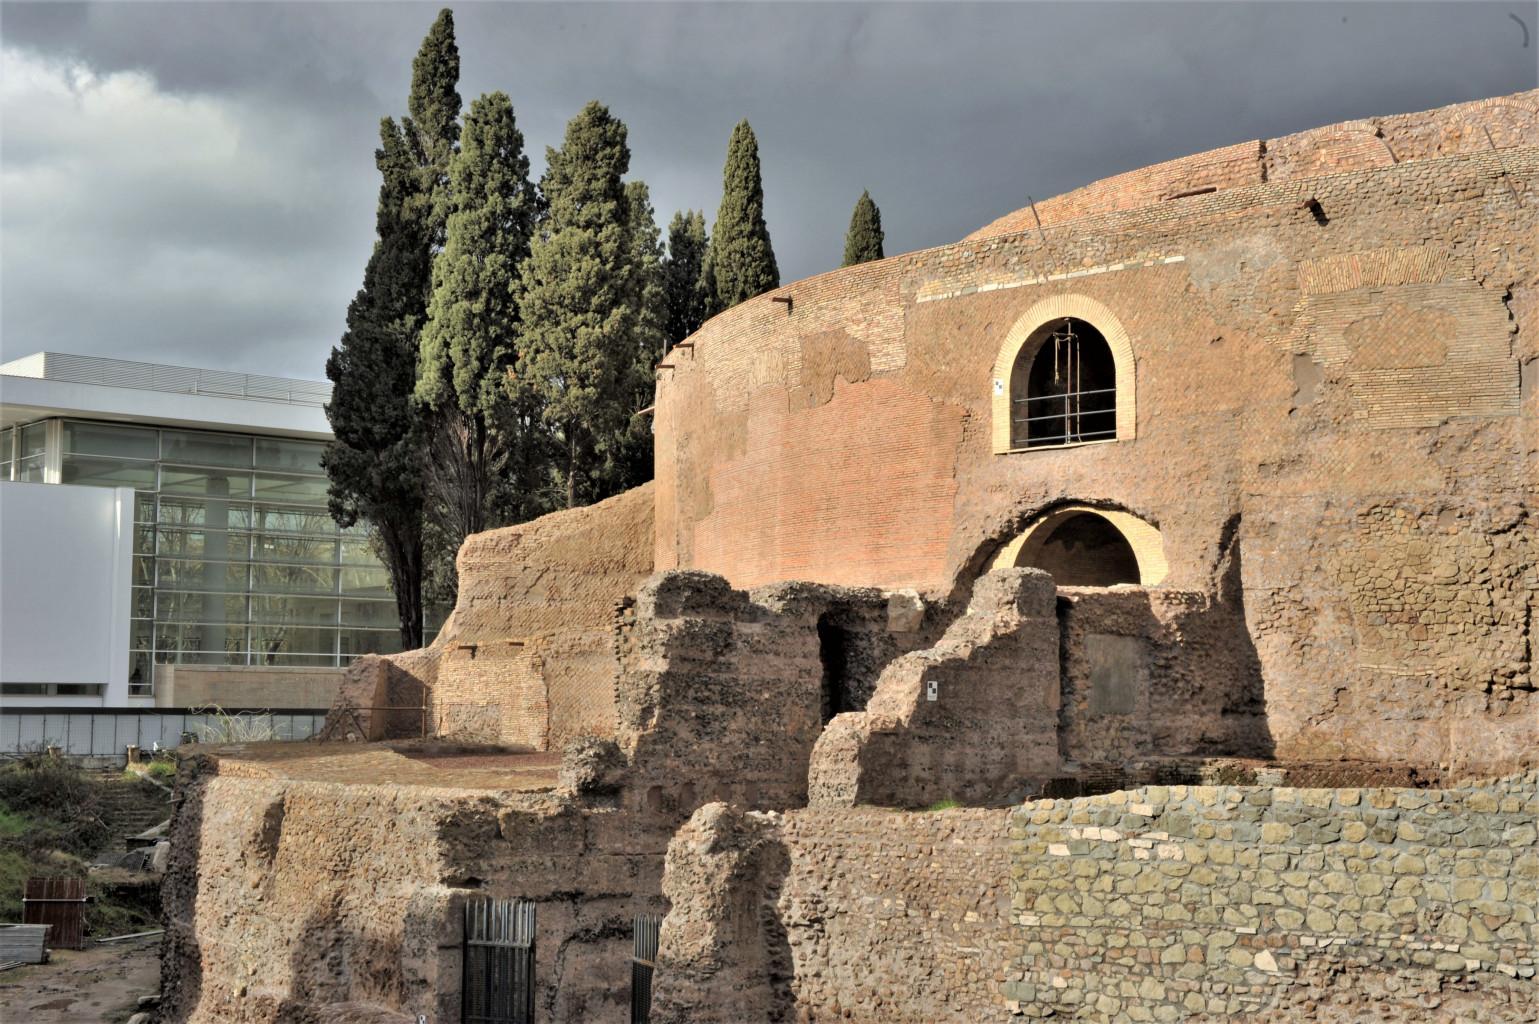 Honouring Augustus